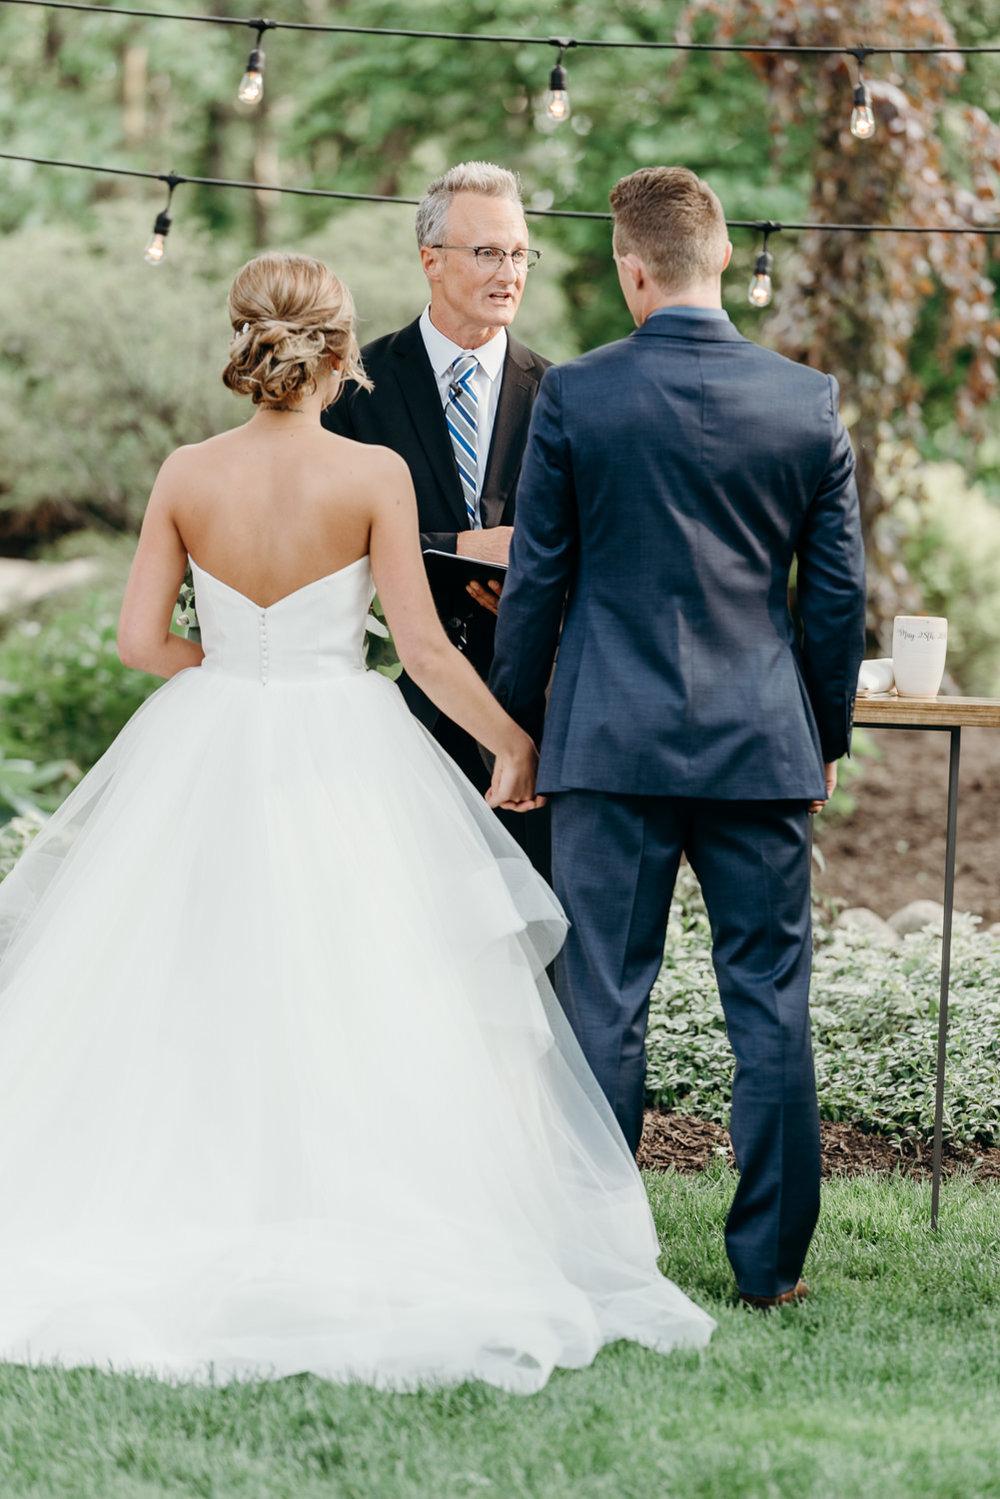 Grant Beachy wedding photographer Goshe, Elkhart, South Bend-039.jpg